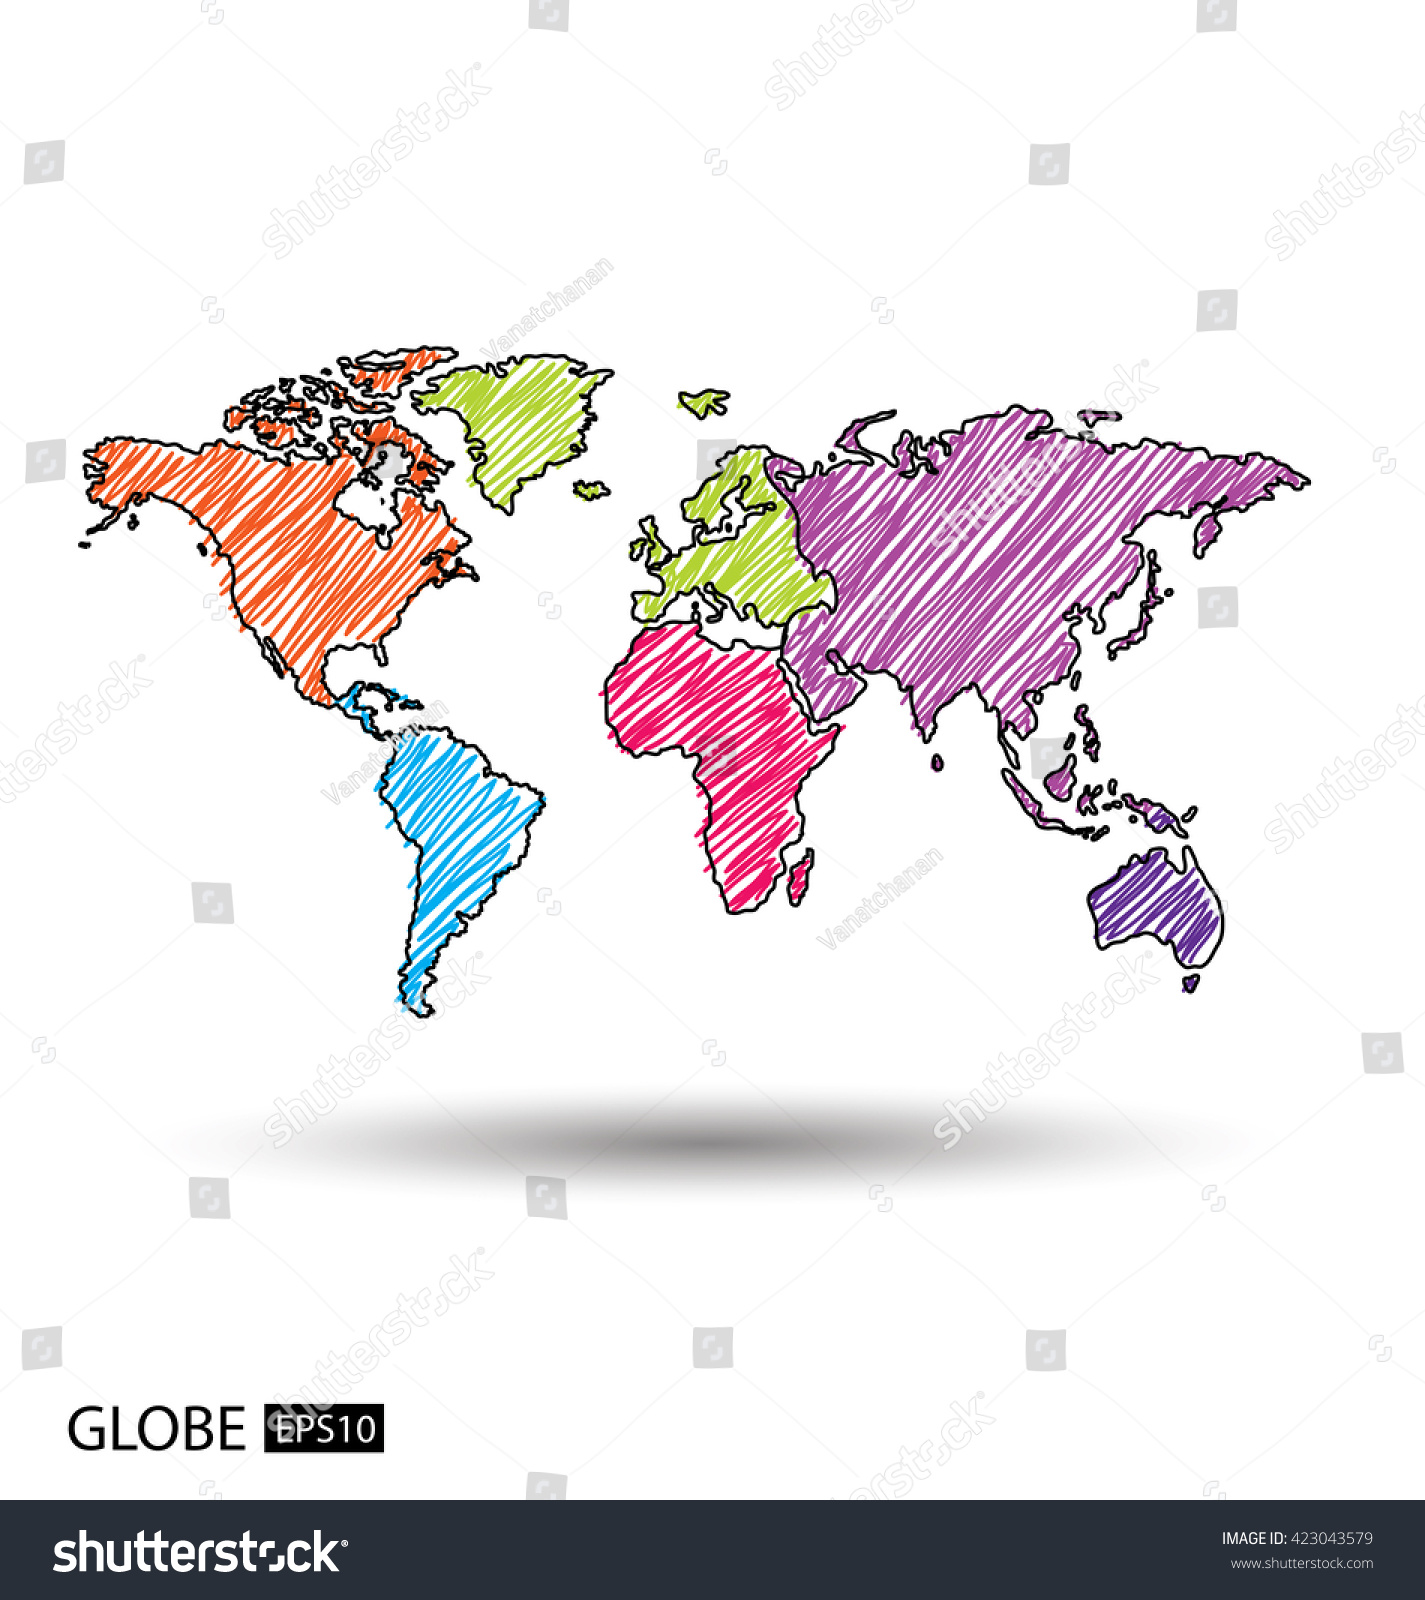 Africa asia australia europe north america vectores en stock africa asia australia europe north america vectores en stock 423043579 shutterstock gumiabroncs Choice Image